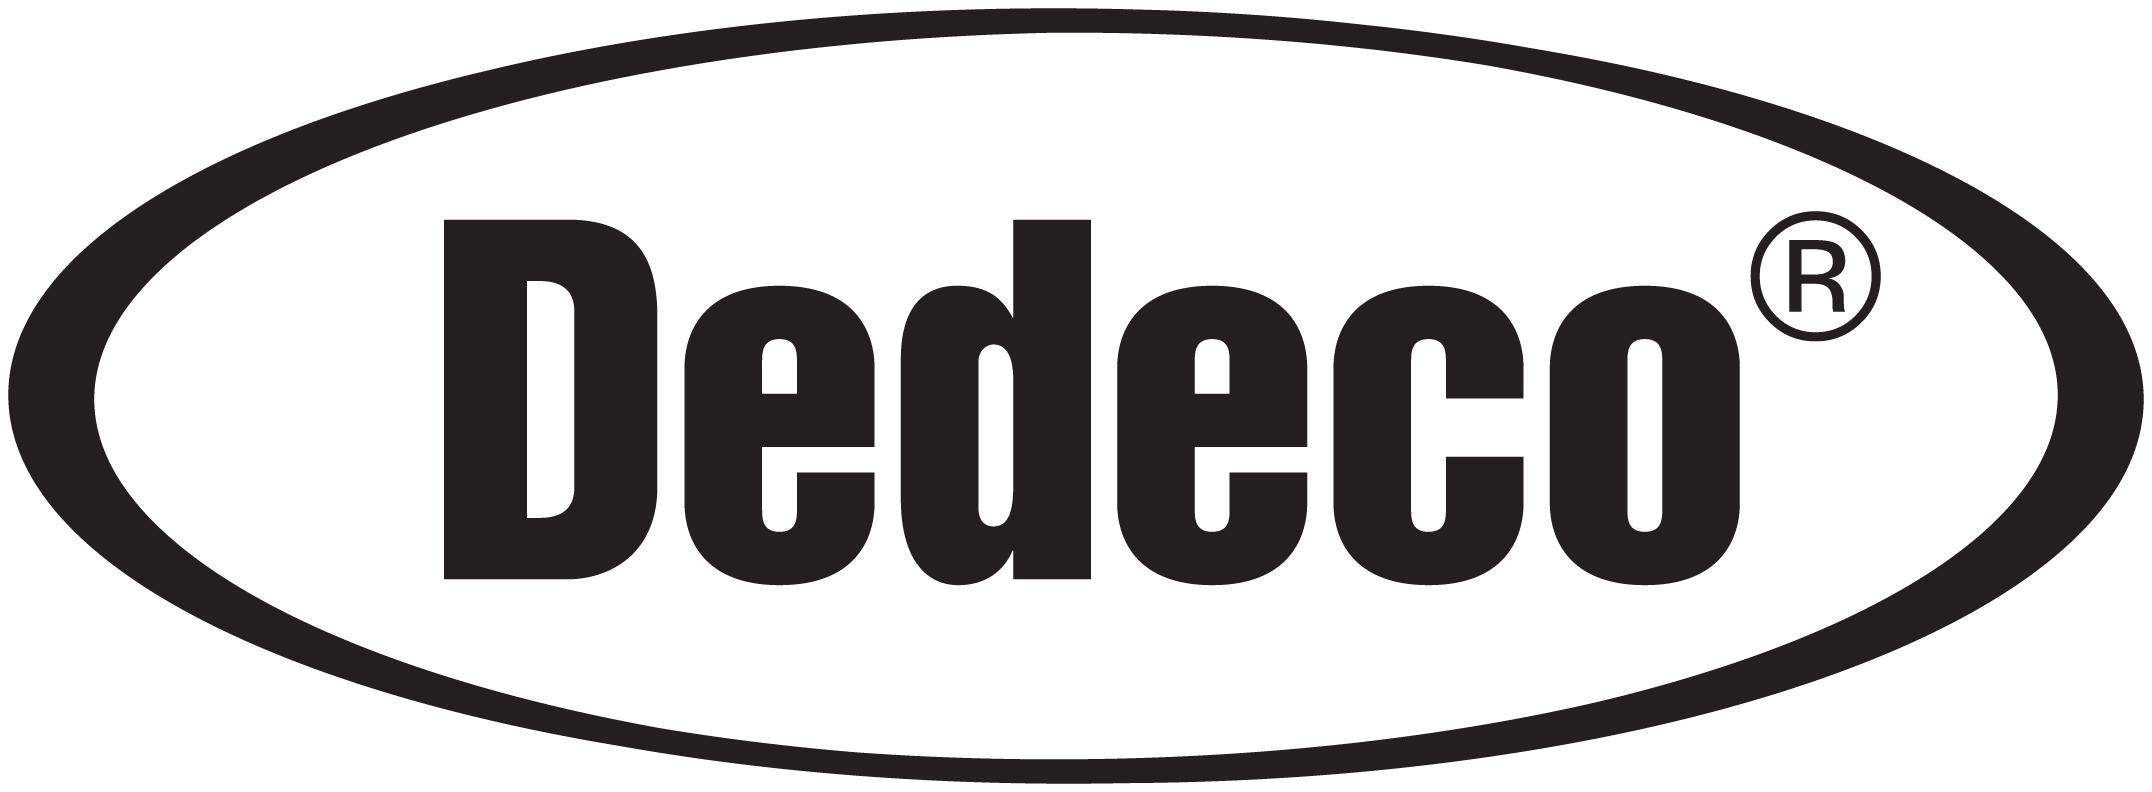 dedeco-logo3.jpg